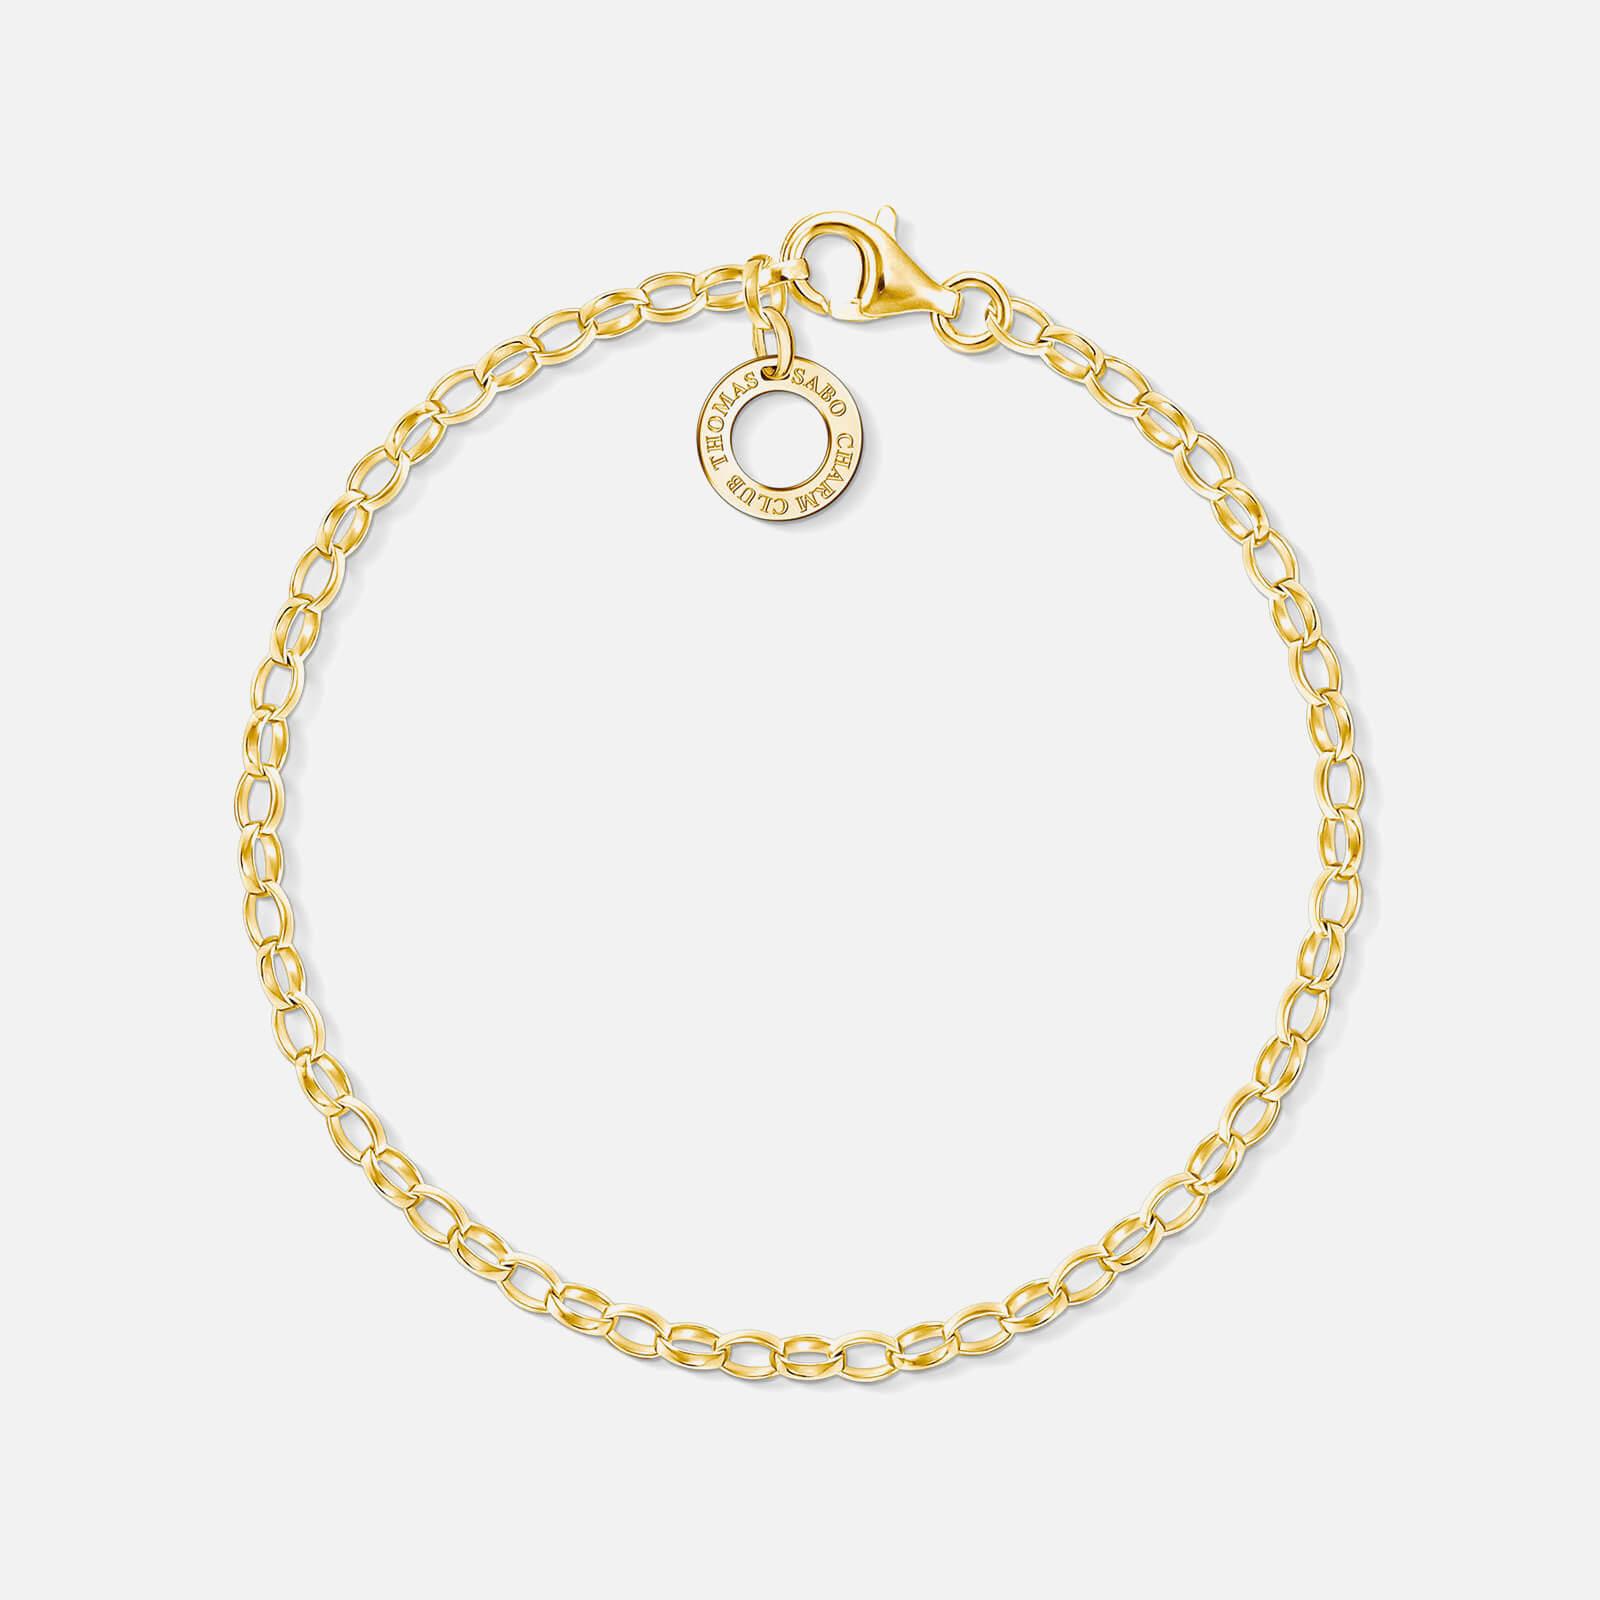 Thomas Sabo Women's Bracelet Chain - Yellow Gold